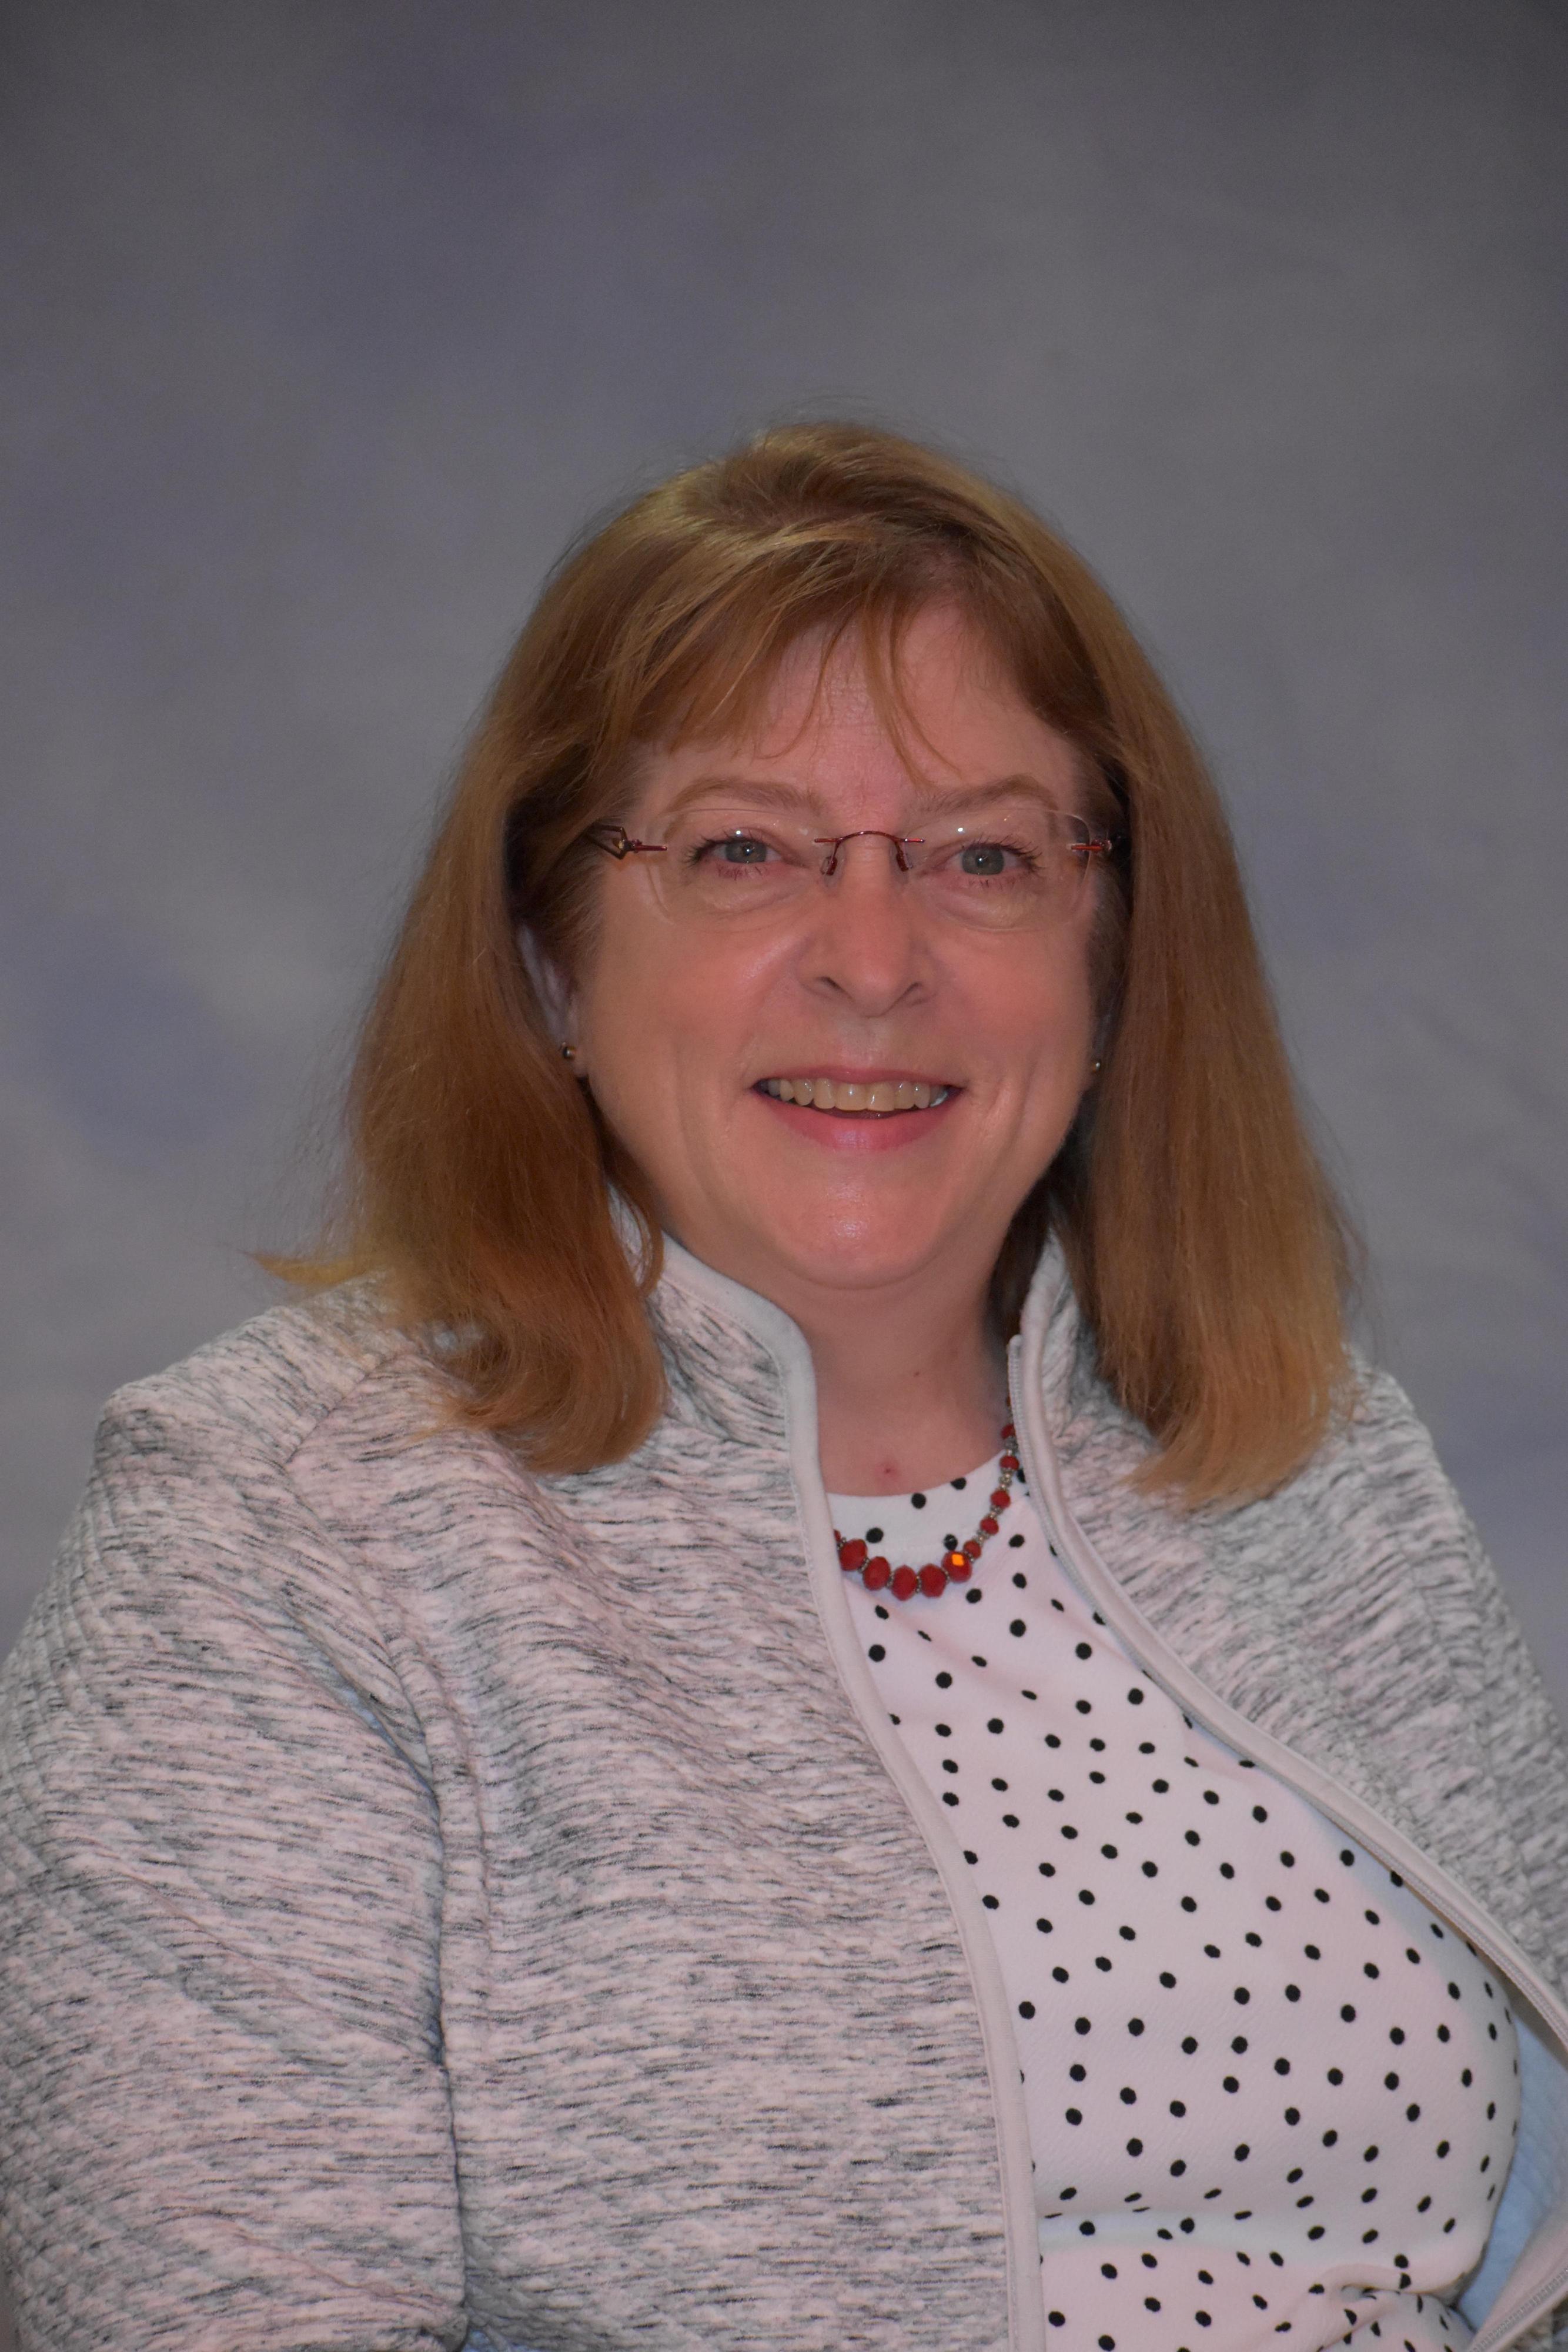 Lorna Klotzbach